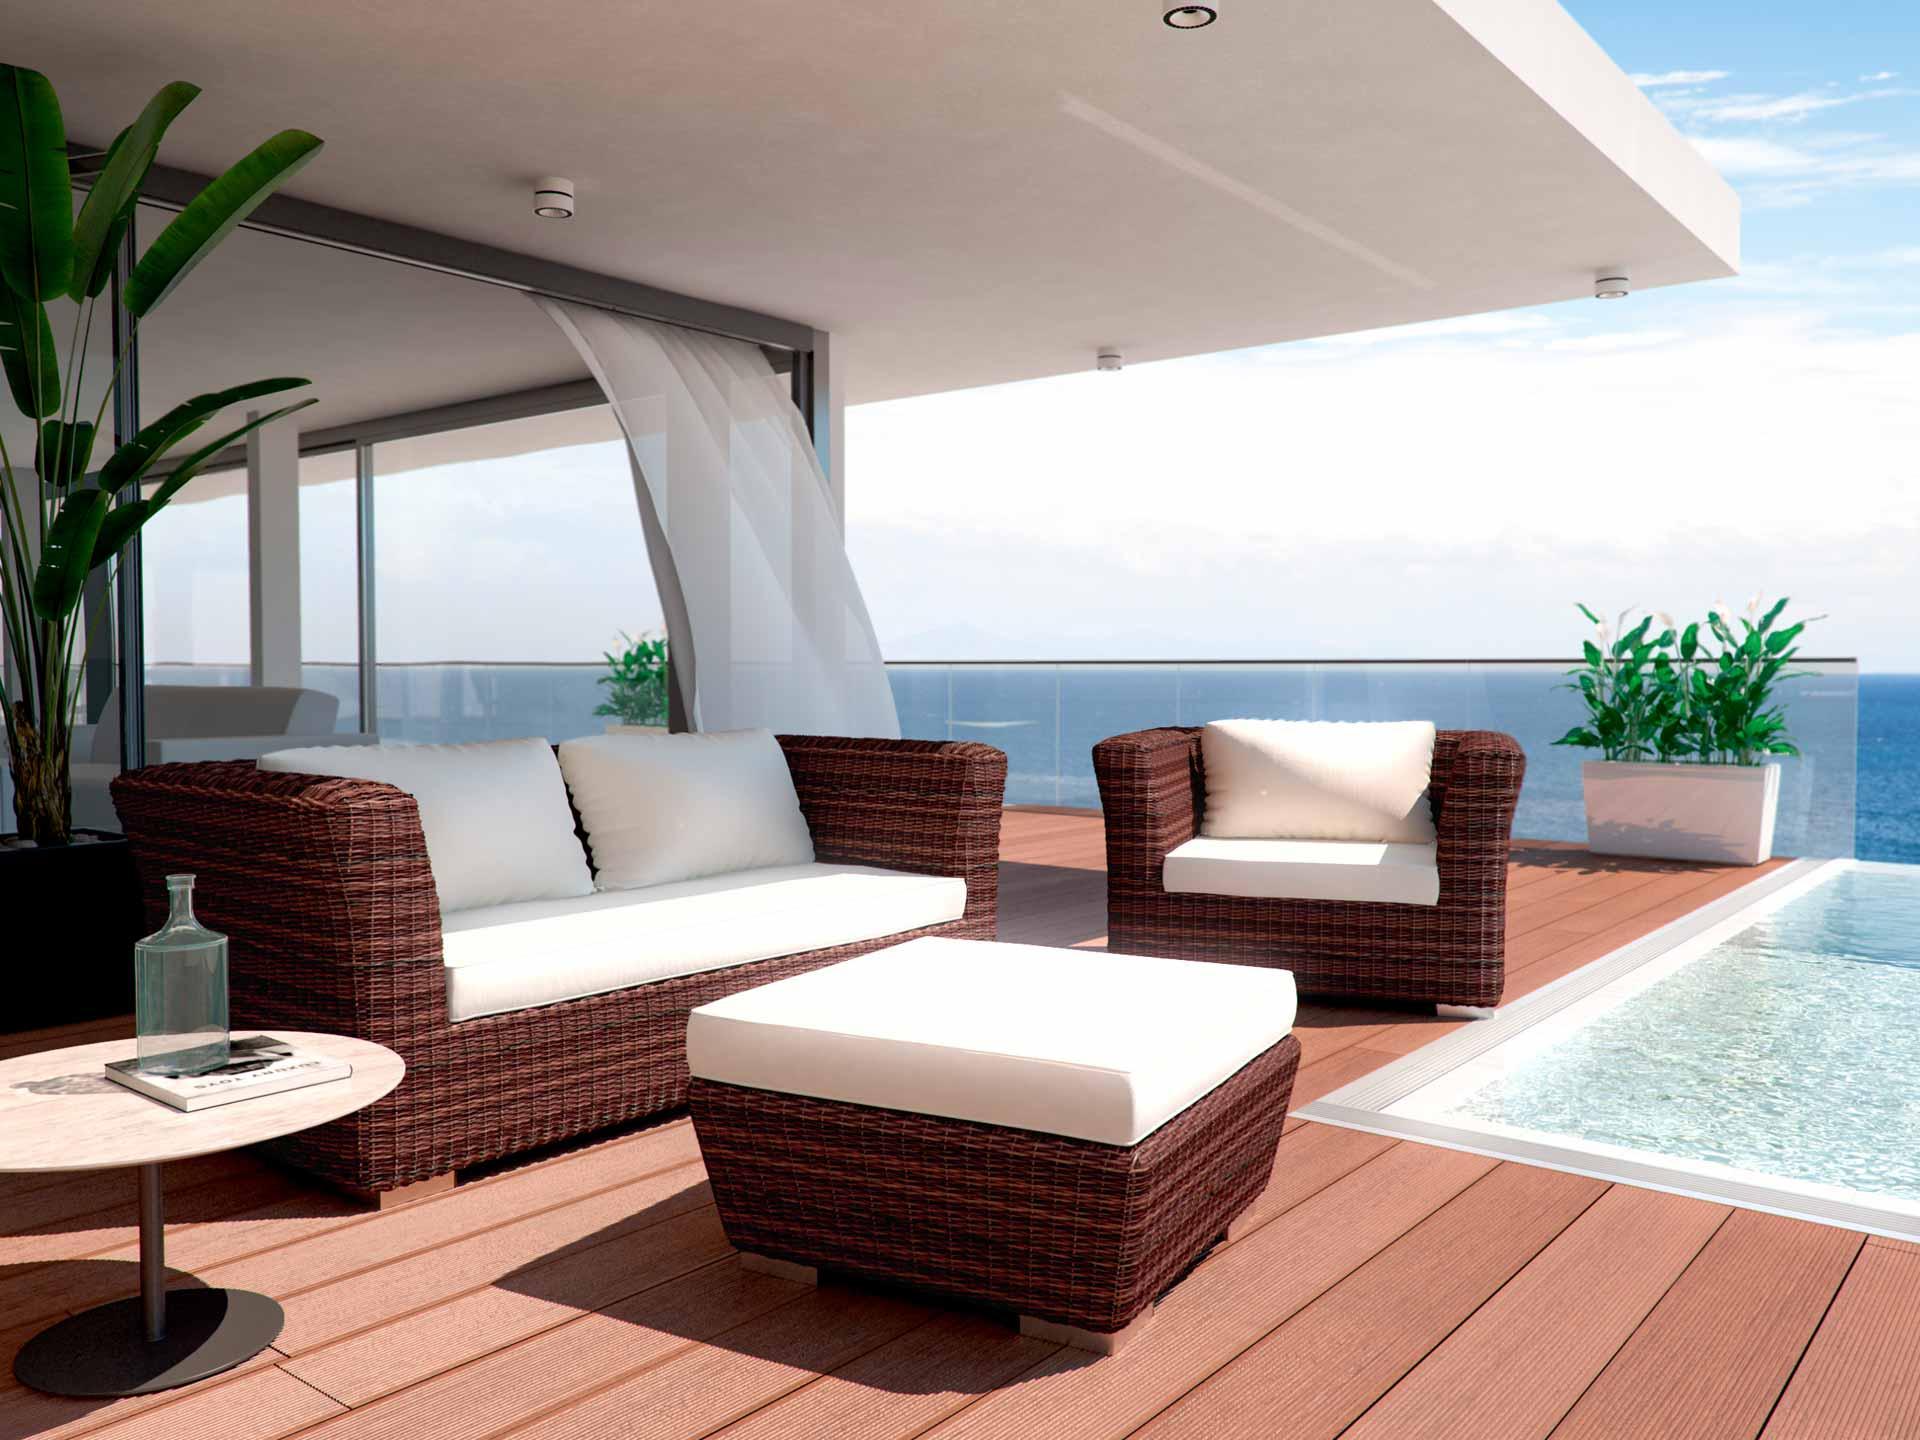 Terrassenmöbel artelia austria terrassenmöbel sitzgruppe rigantona s aus polyrattan